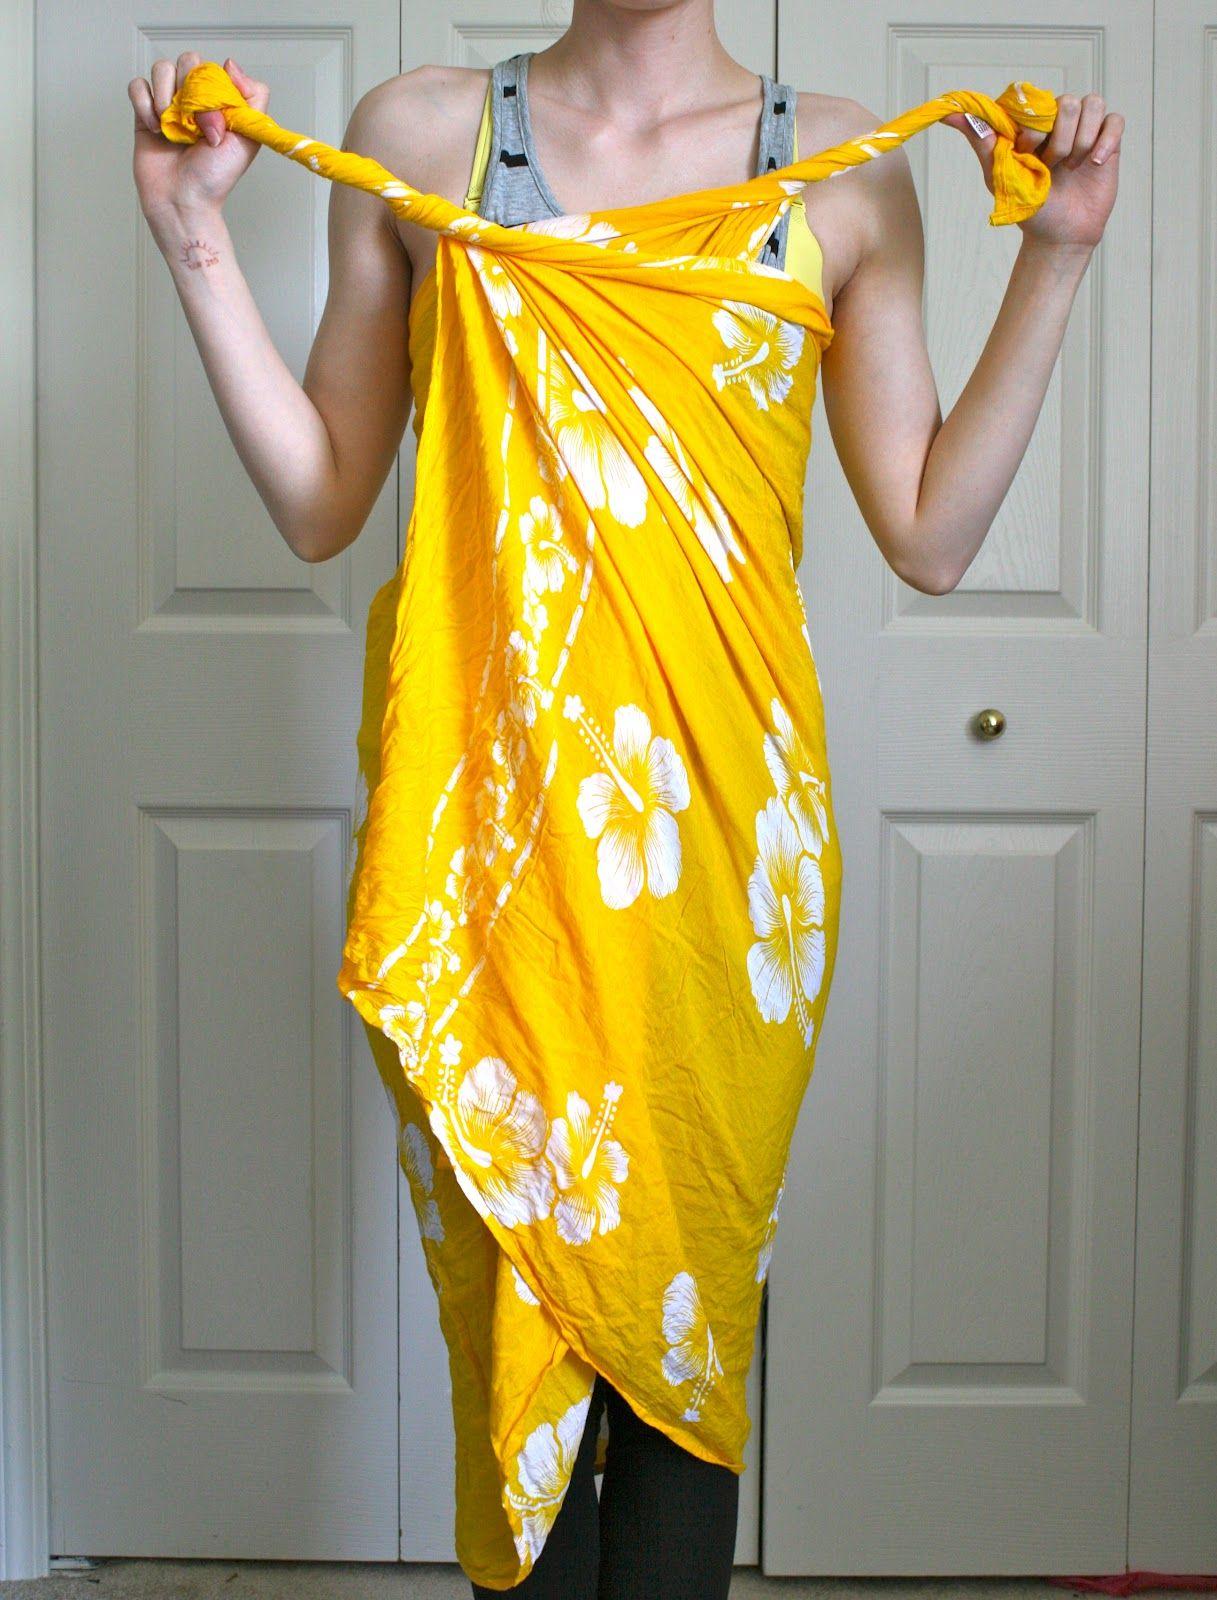 Diy No Sew Beach Cover How To Use A Pareo Sarong Fashion Beach Sarong Beach Dresses Diy [ 1600 x 1217 Pixel ]